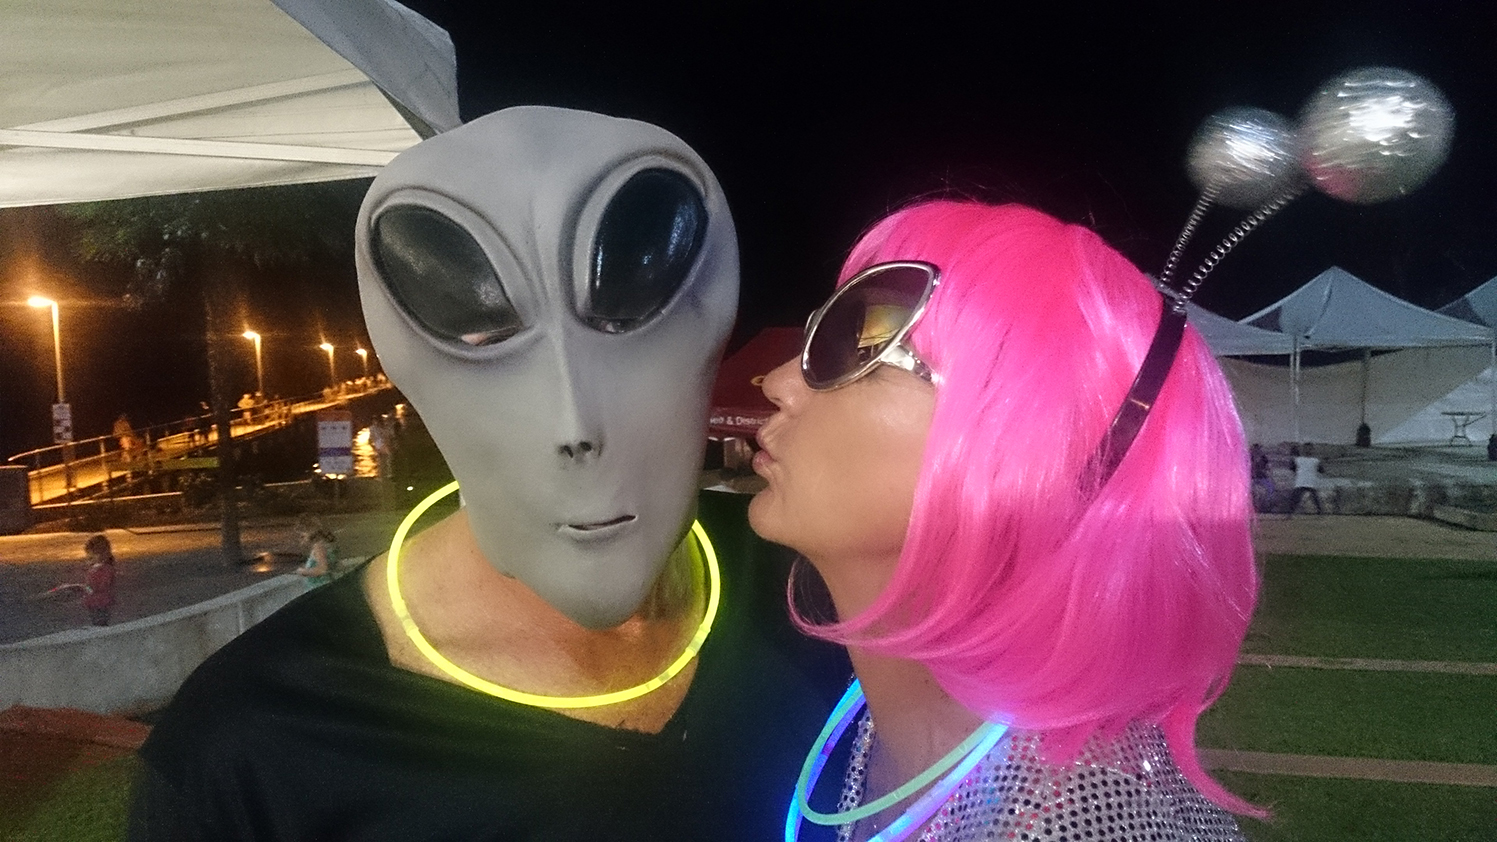 We love aliens